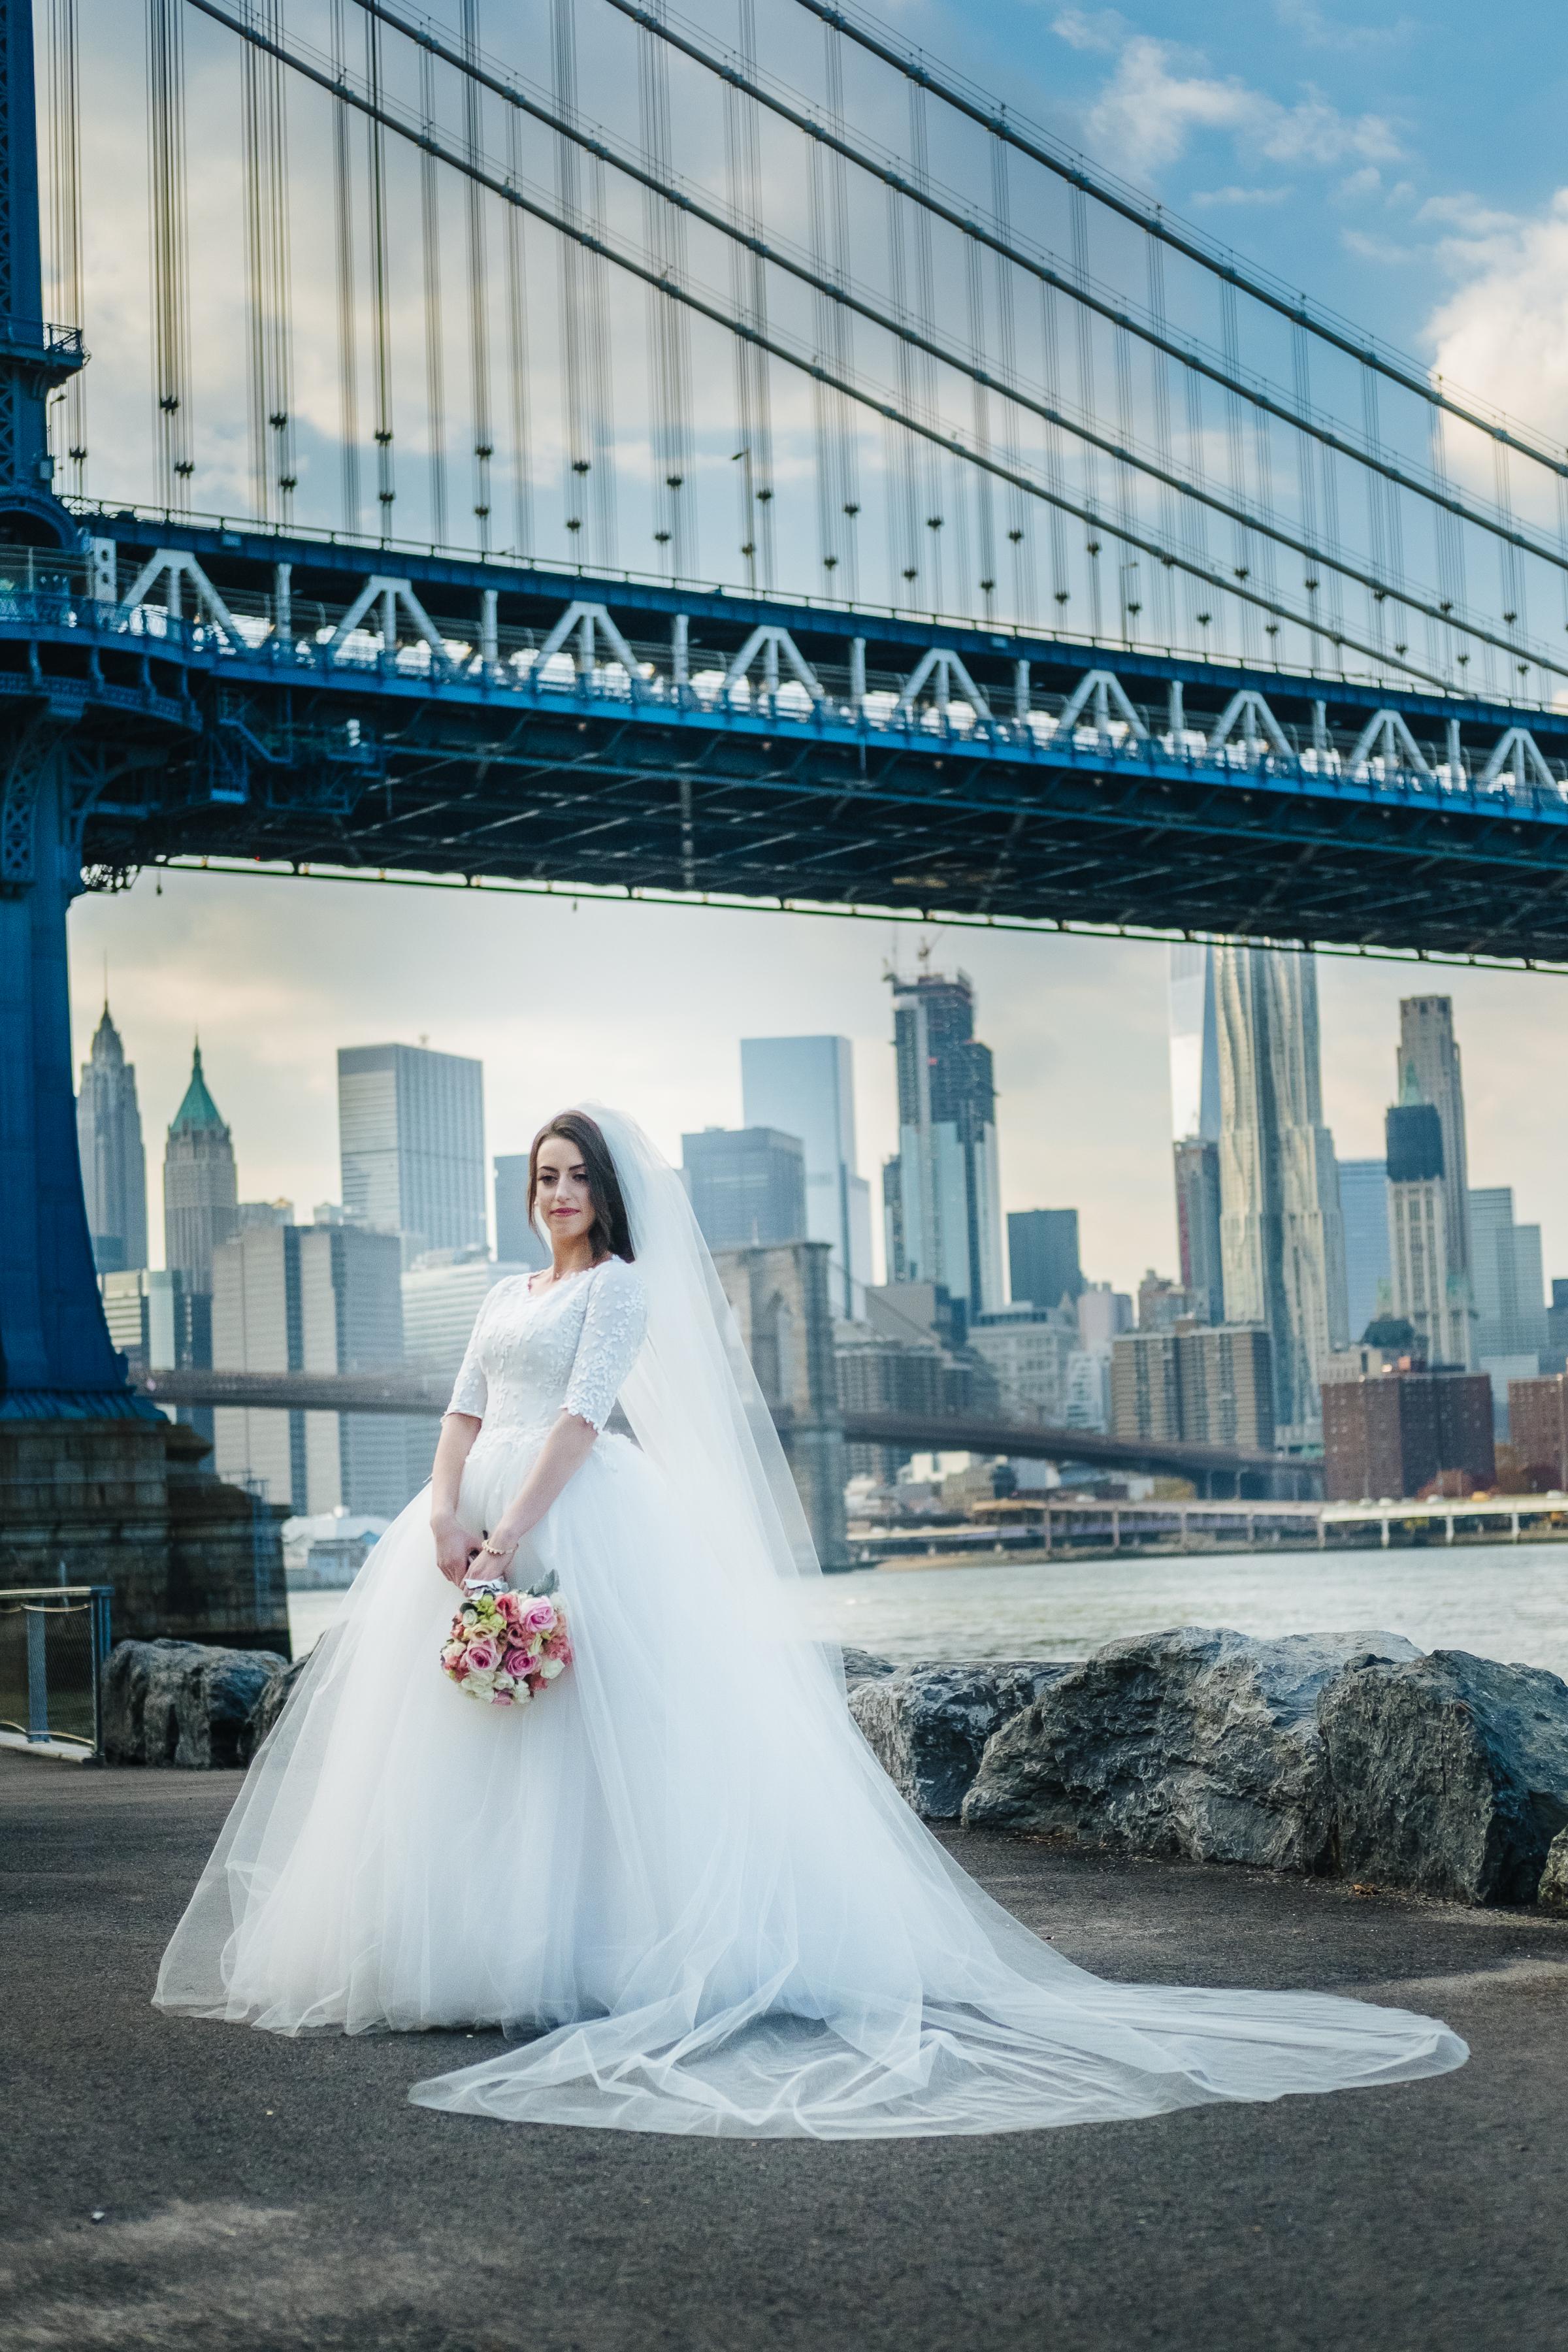 Wedding Yanki & Tzivia - Eliau Piha studio photography-0052.jpg